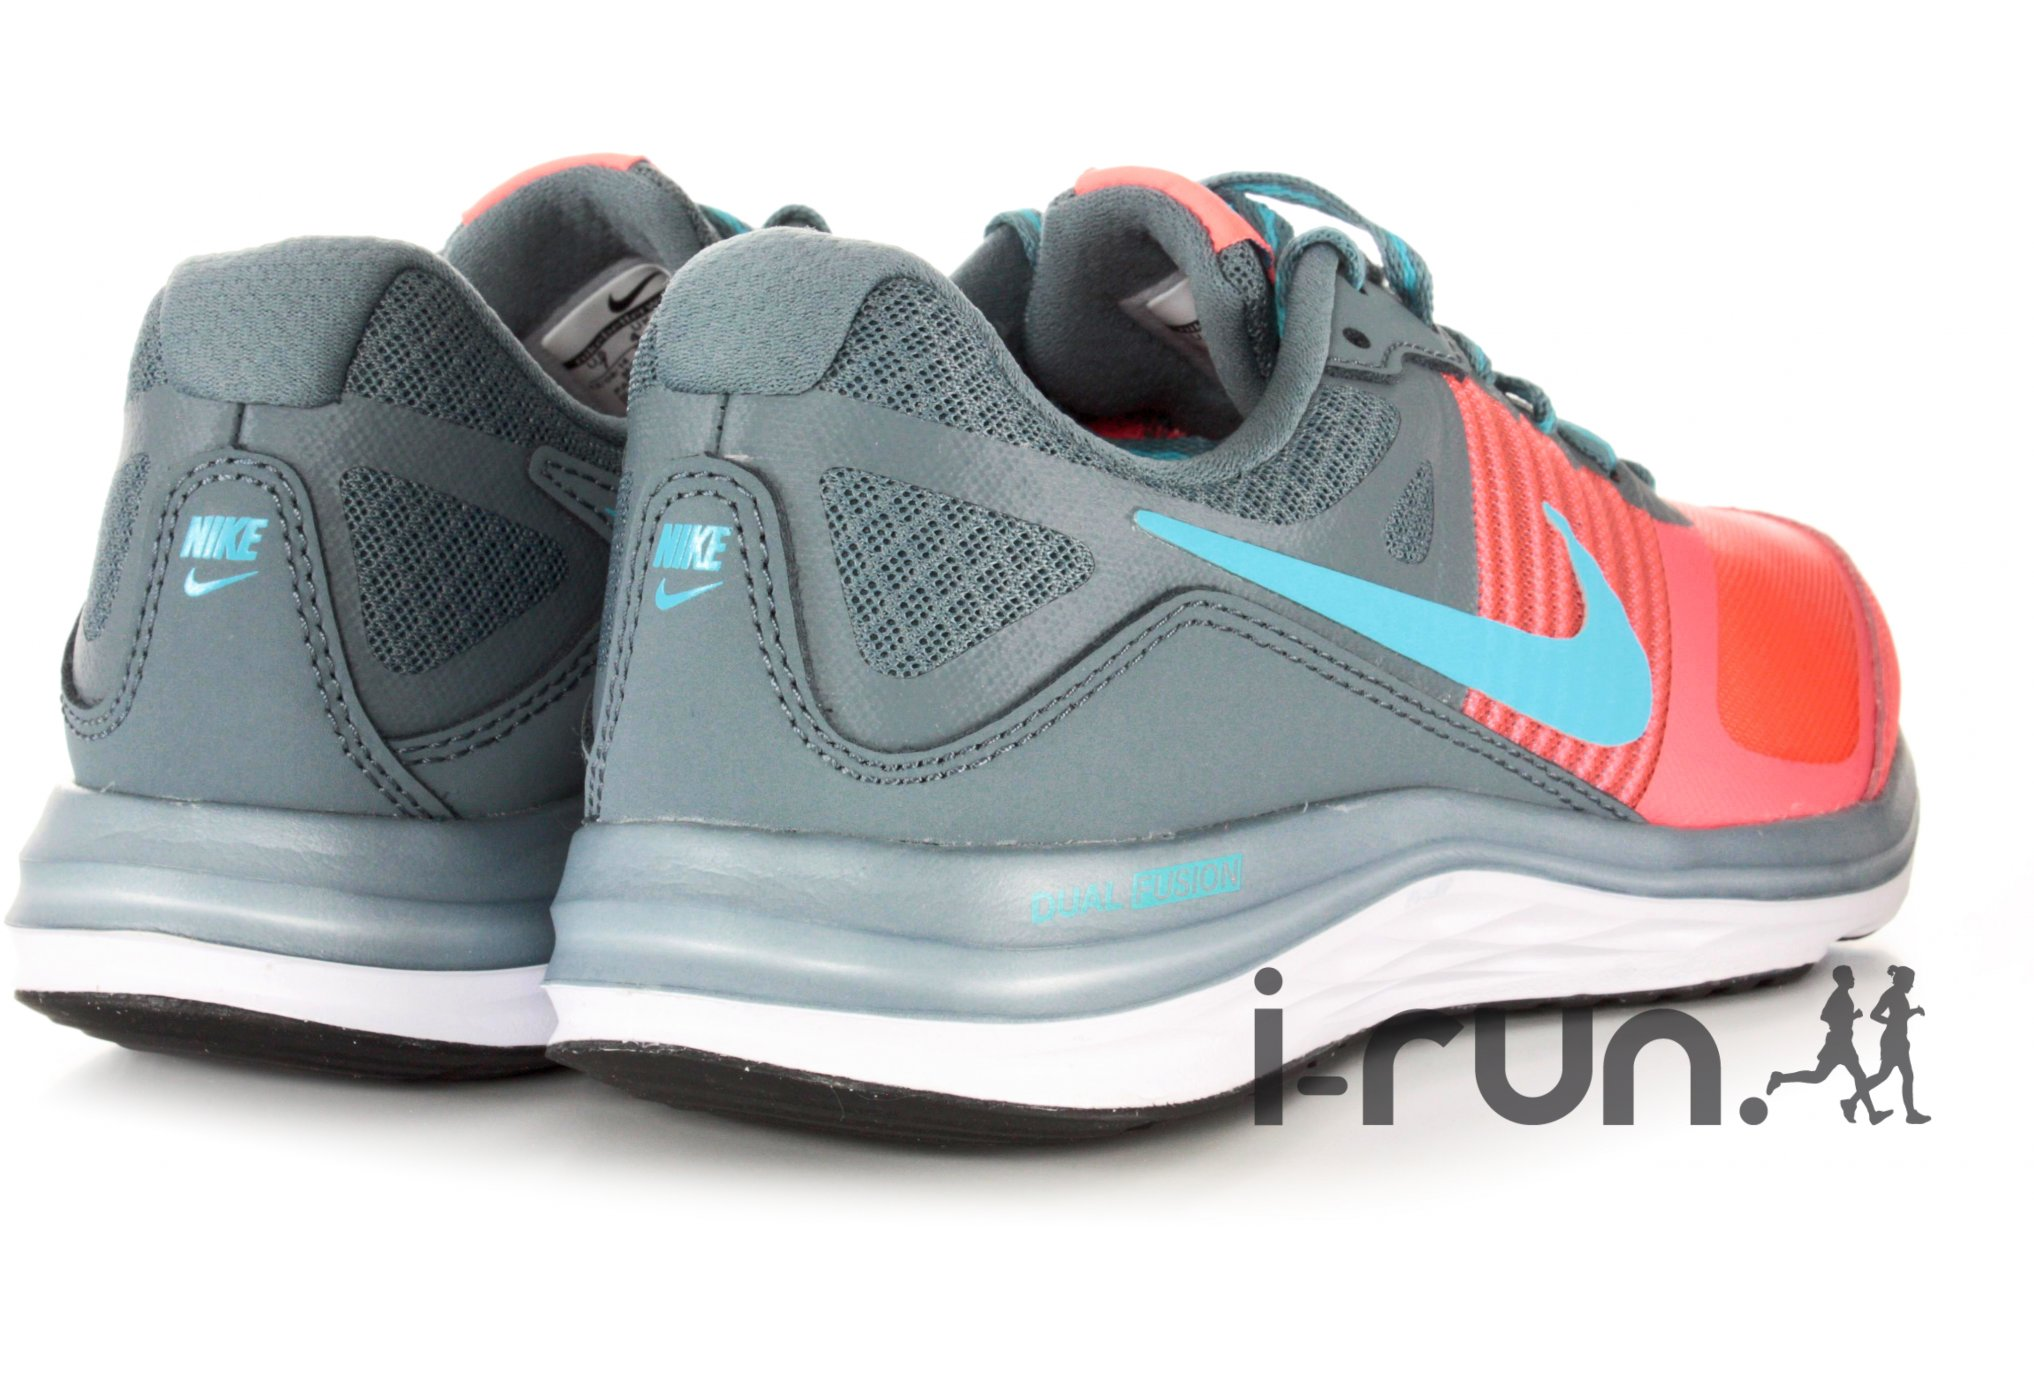 Nike dual fusion x w pas cher destockage nike running dual fusion x w en promo - Avis destockage fitness ...